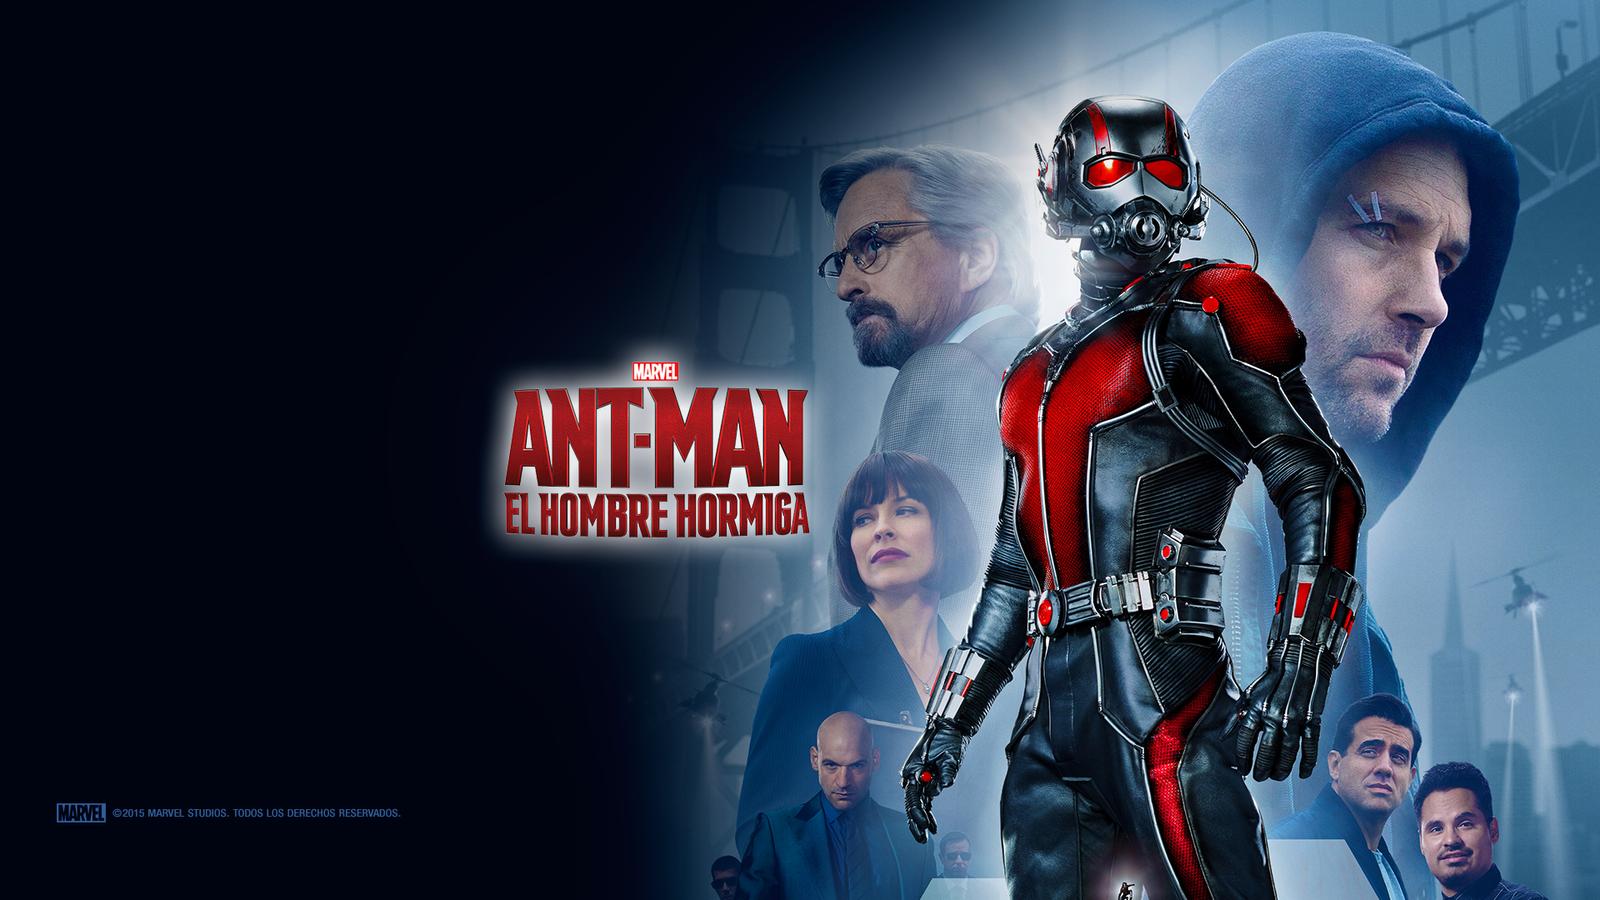 Ant Man Retina Movie Wallpaper: Primer Wallpaper Latino De ANT-MAN (2015). By DWOWForce On